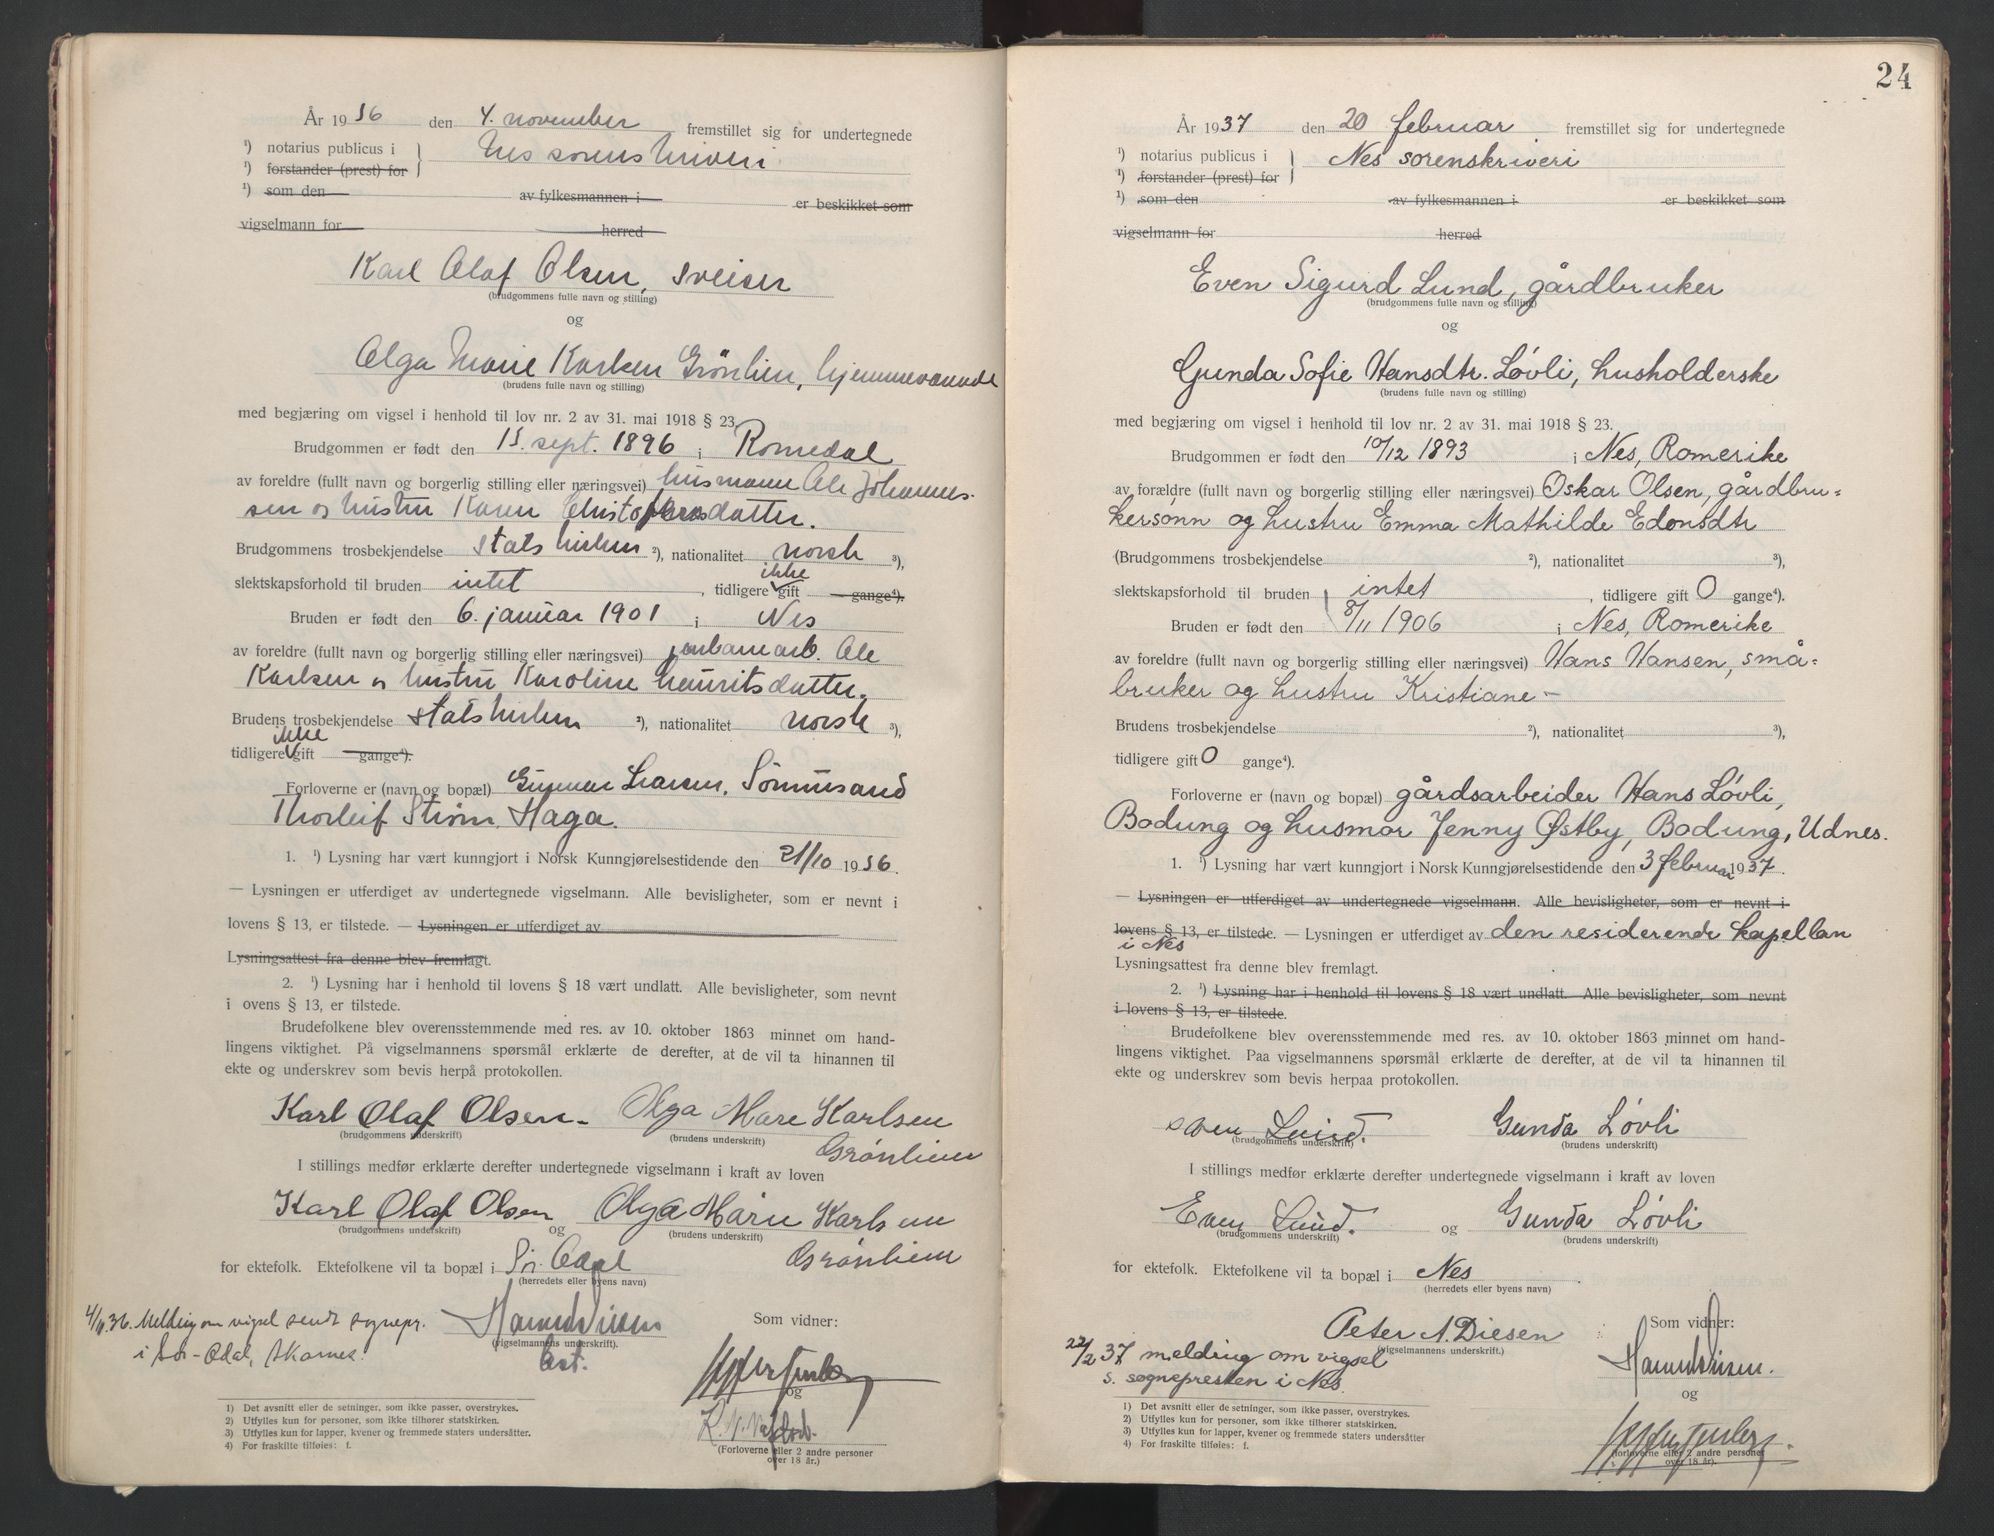 SAO, Nes tingrett, L/Lc/Lca/L0001: Vigselbok, 1920-1943, s. 24